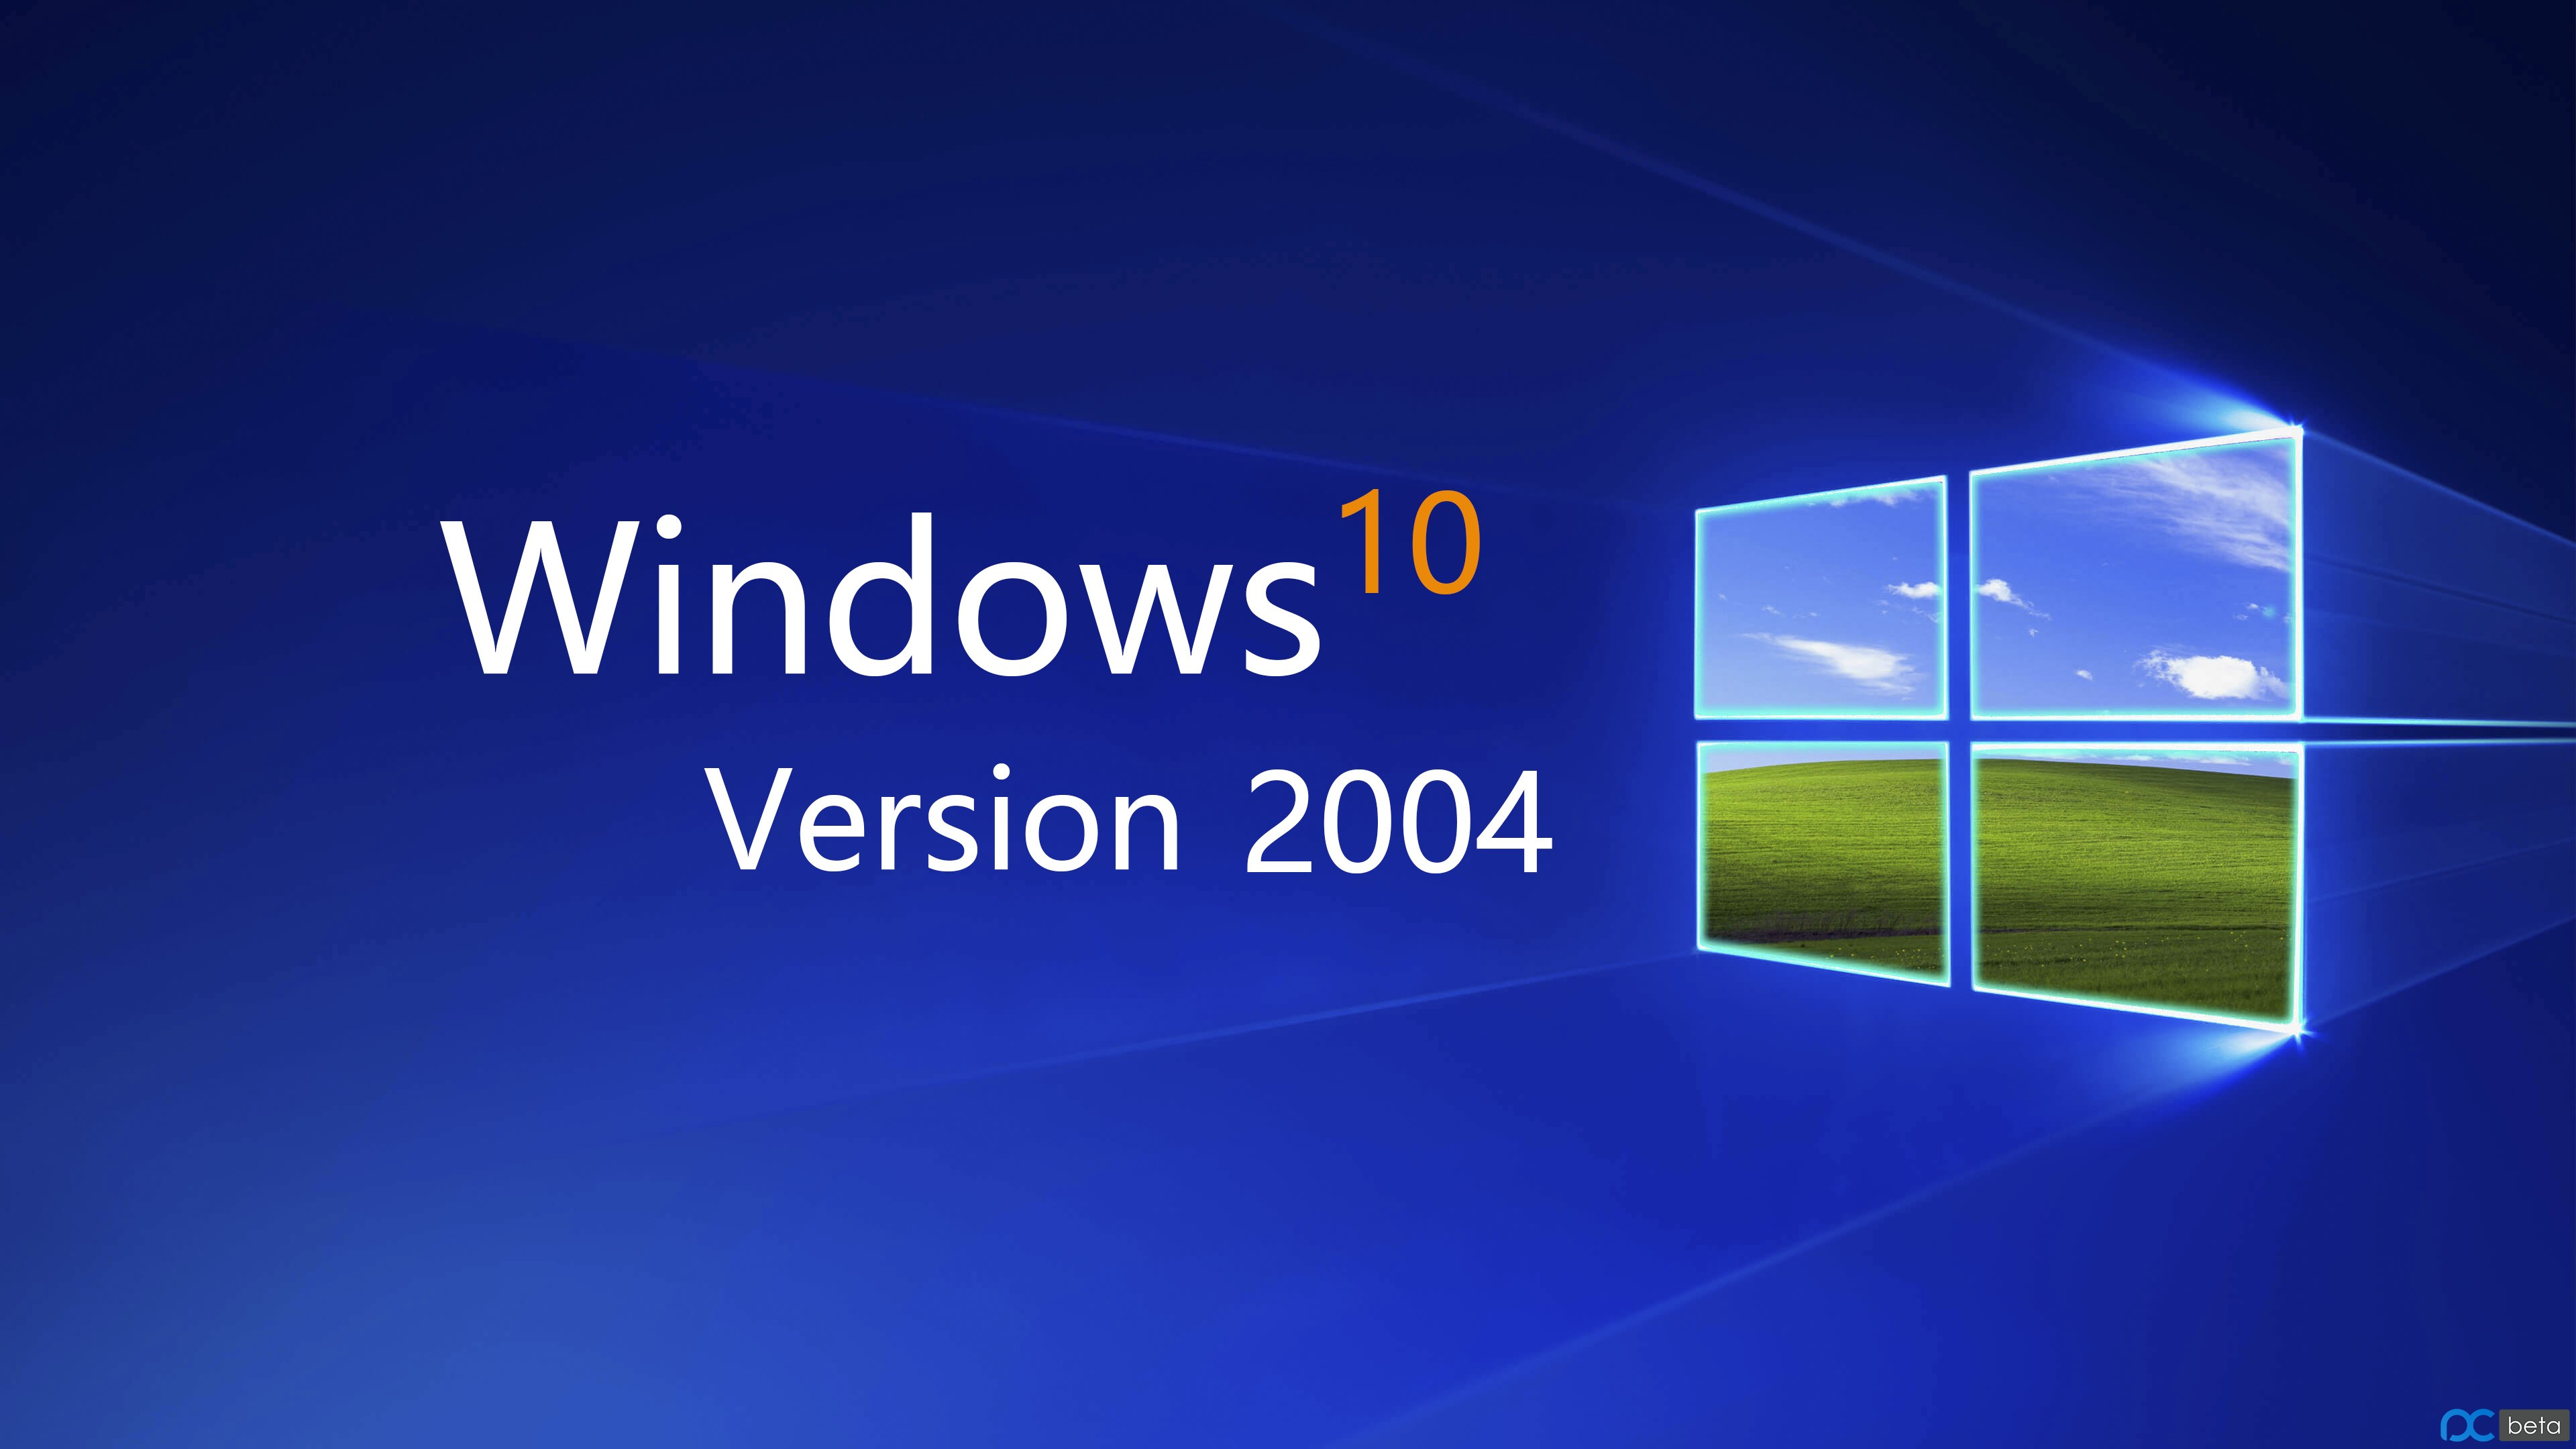 windows-10-pro-wallpaper-3840x2160.jpg